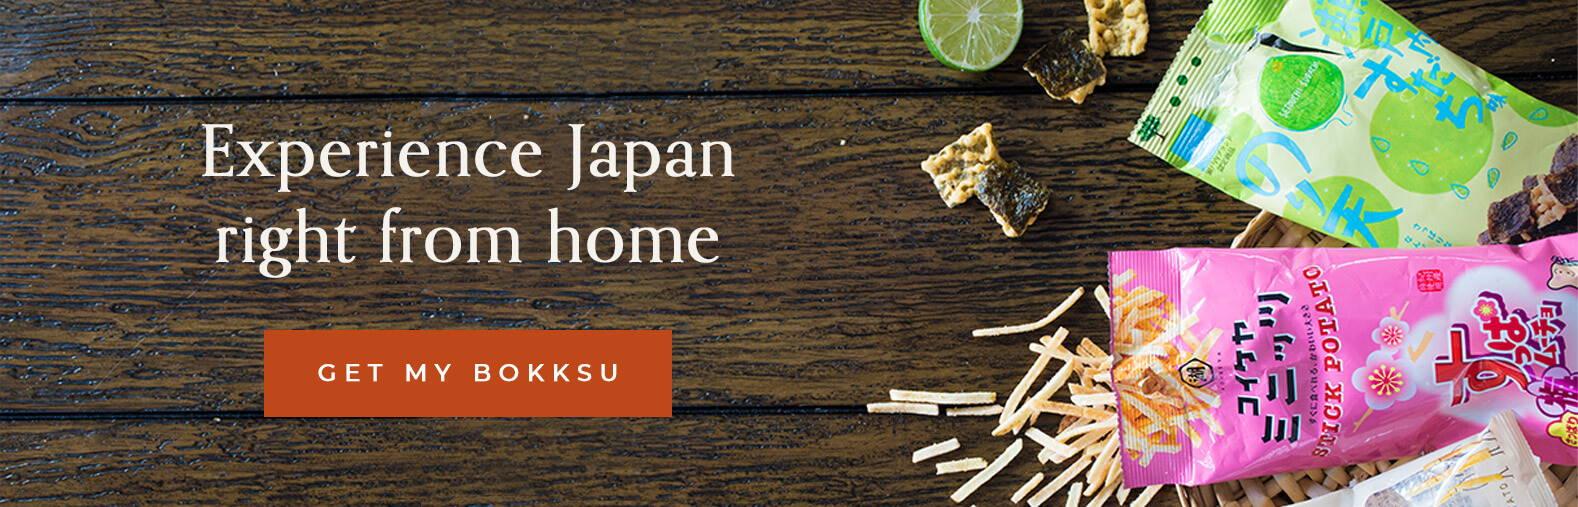 join bokksu japanese snack subscription box service today